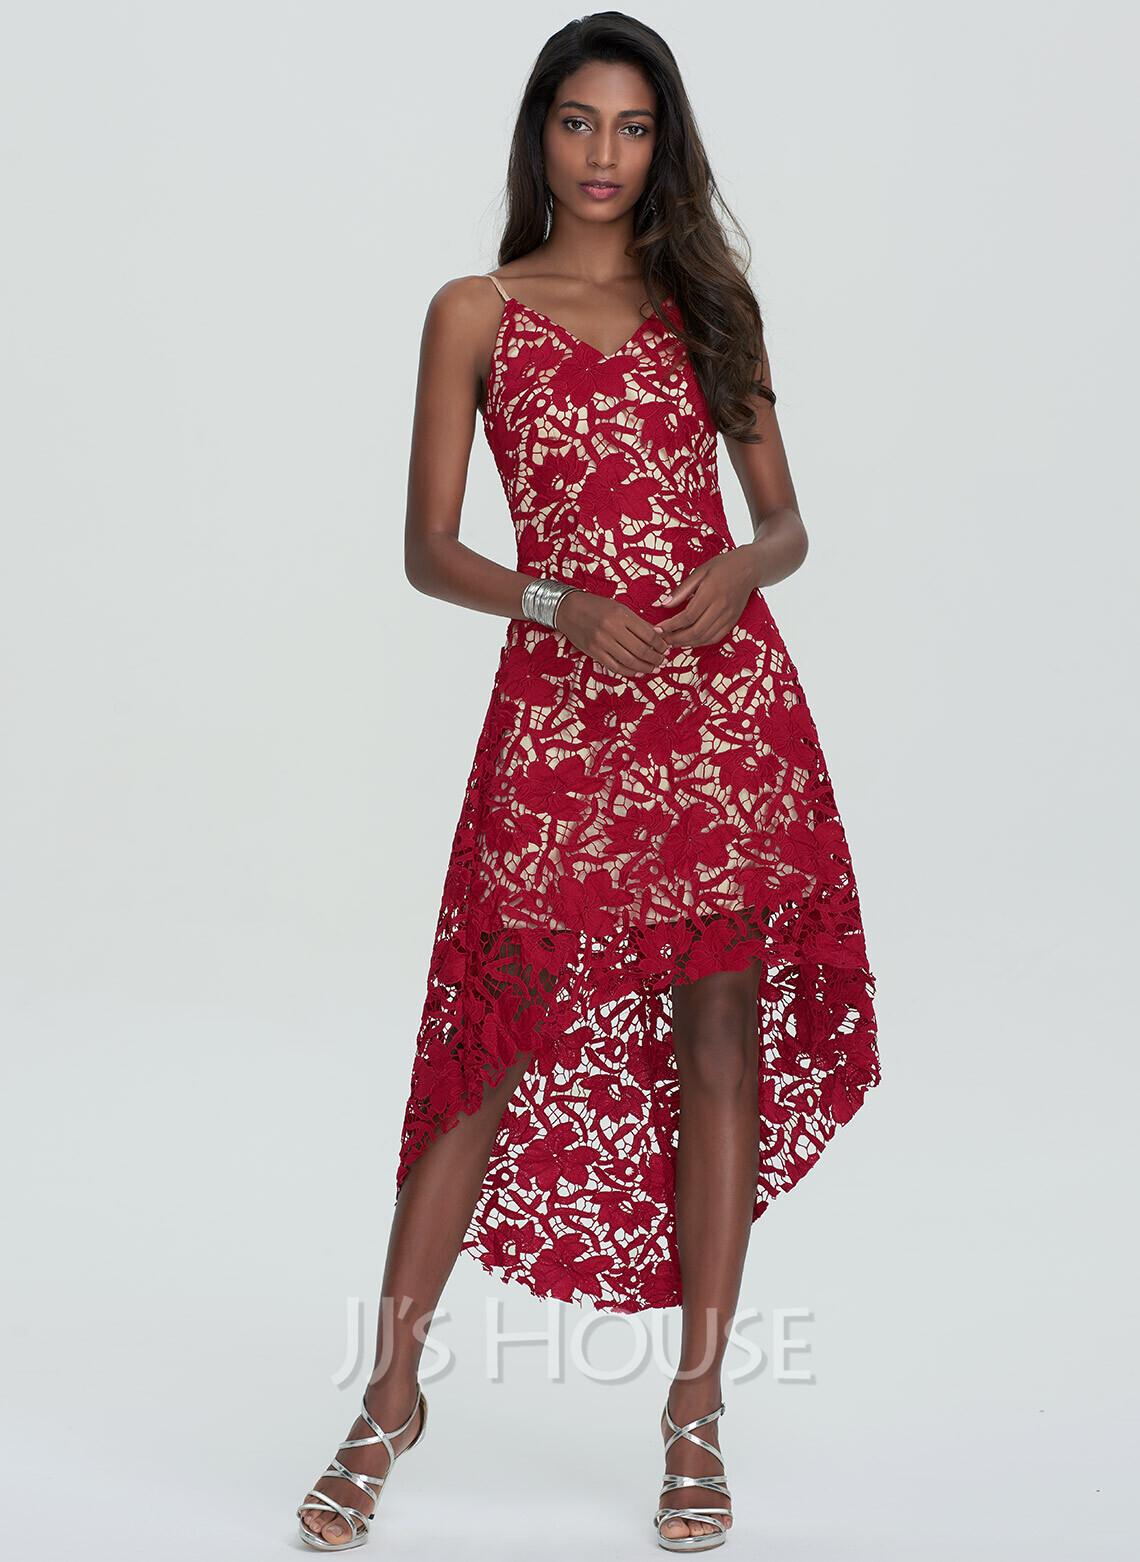 A-Line V-neck Asymmetrical Lace Homecoming Dress